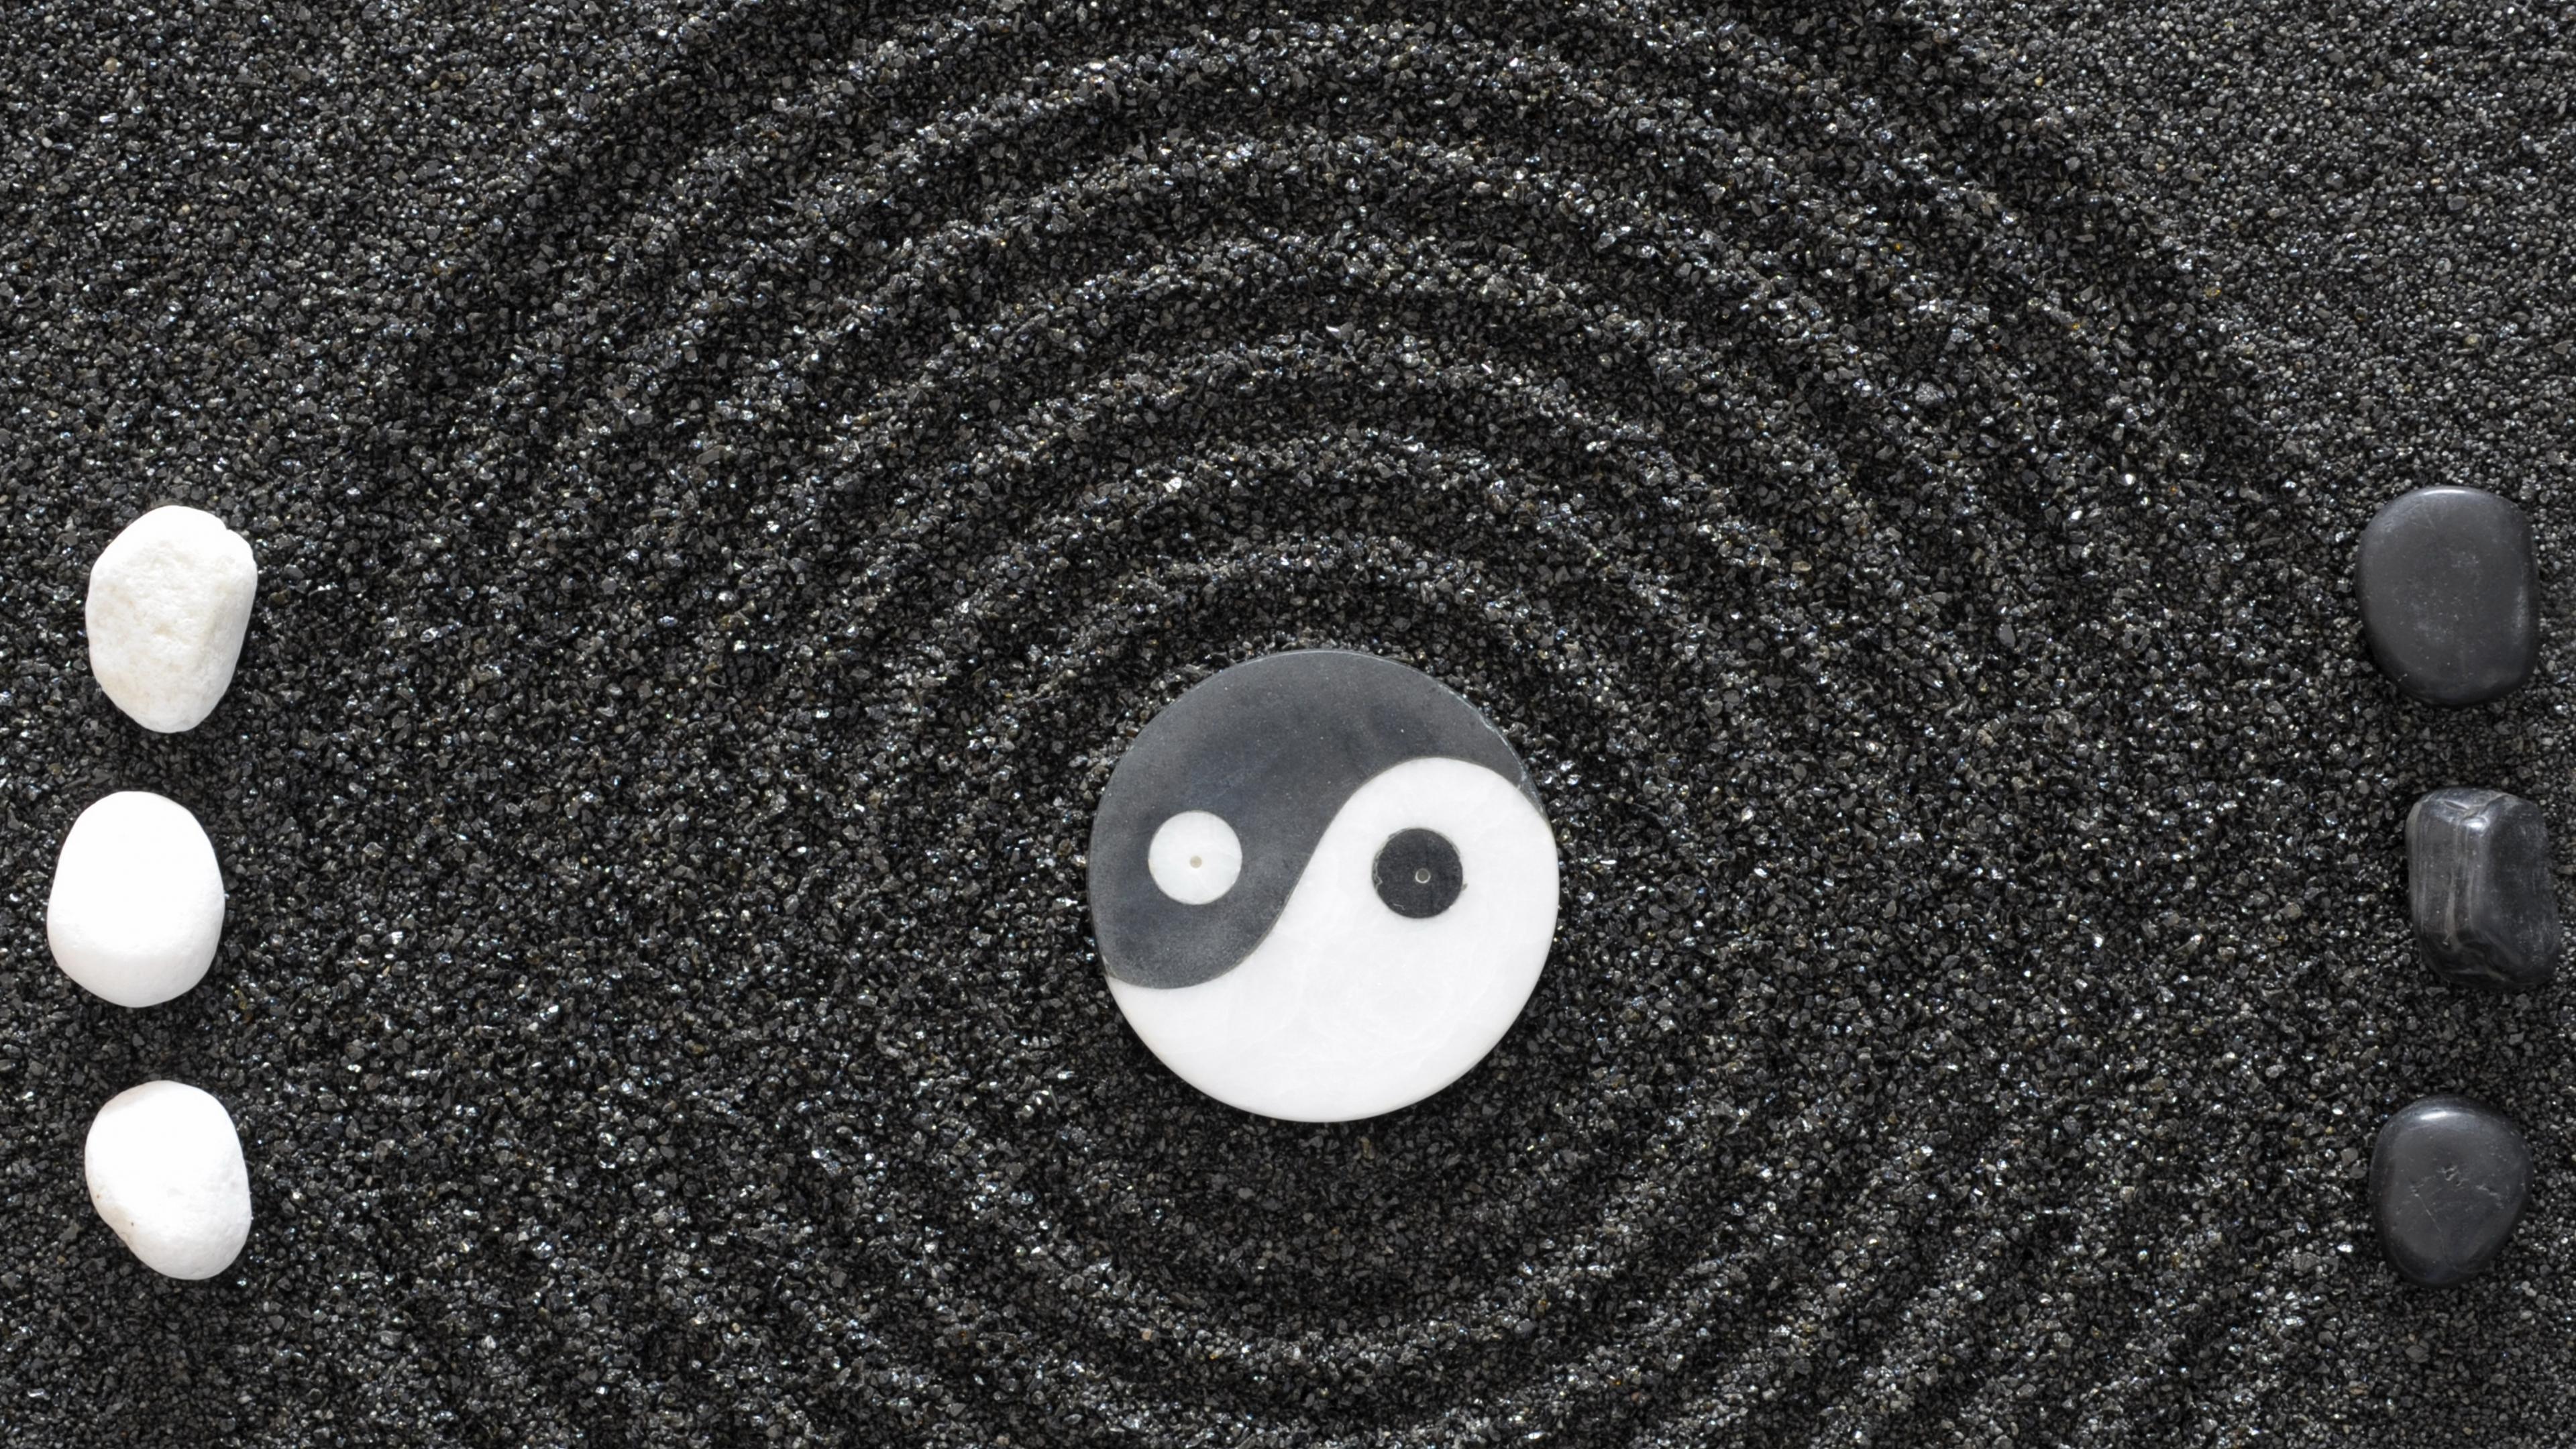 Yin Yang Wallpaper 1920x1200 - WallpaperSafari